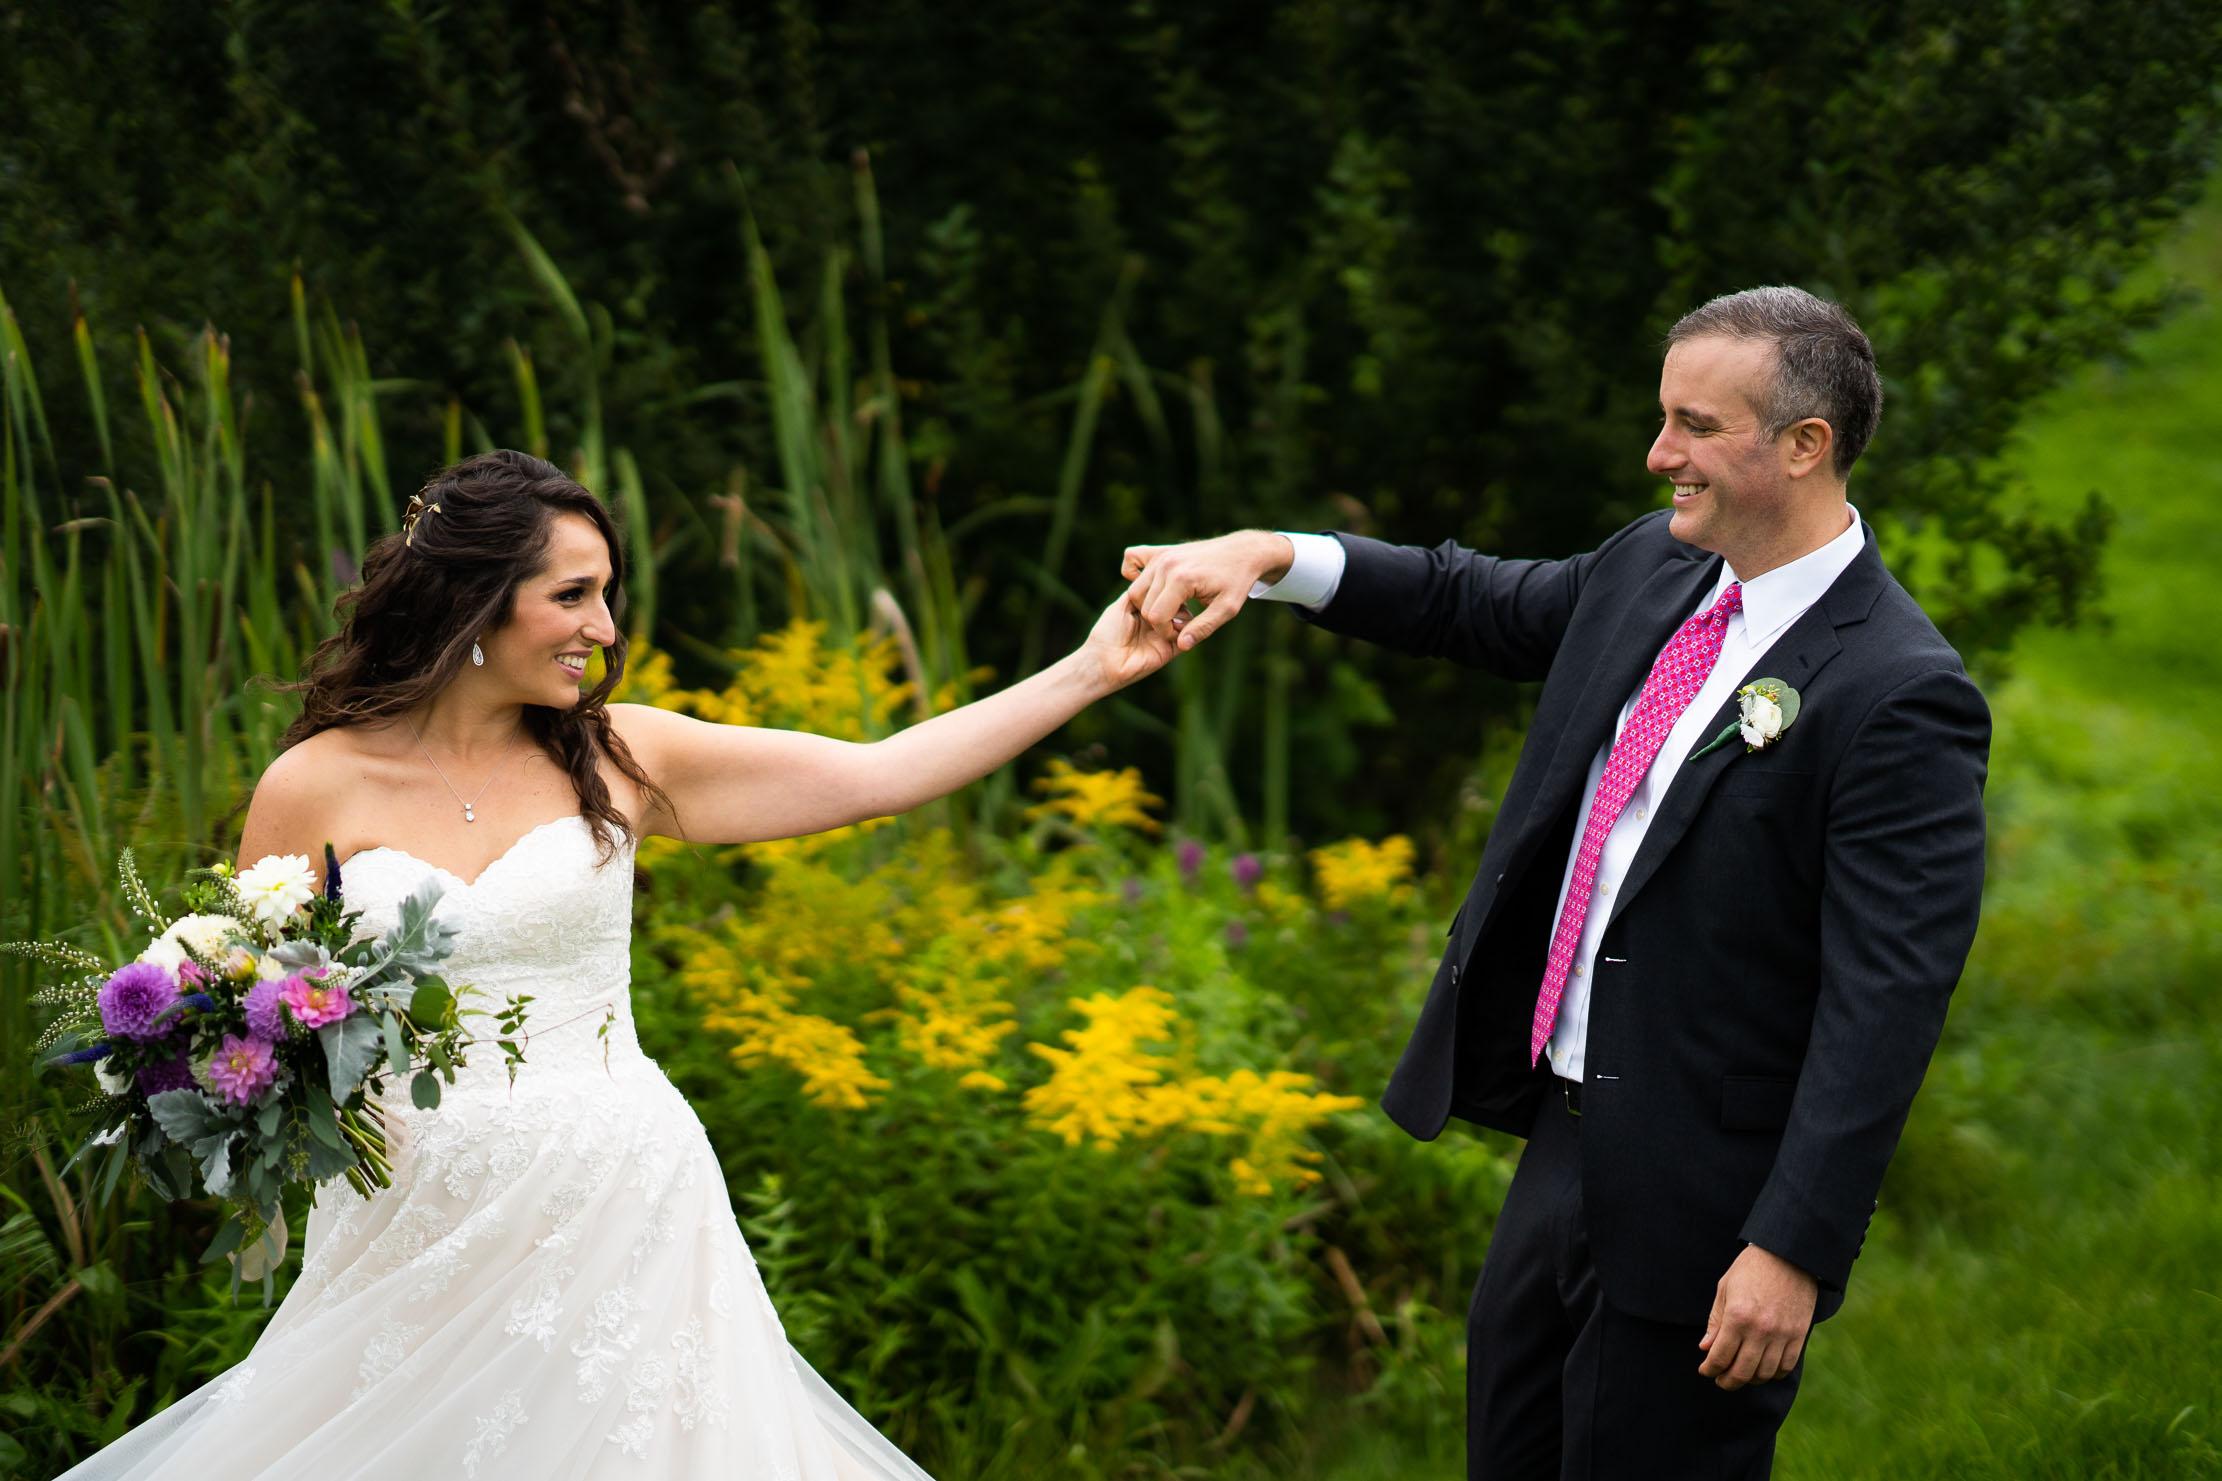 Wings-Castle-Millbrook-NY-Upstate-Wedding-Photographer-1055.jpg